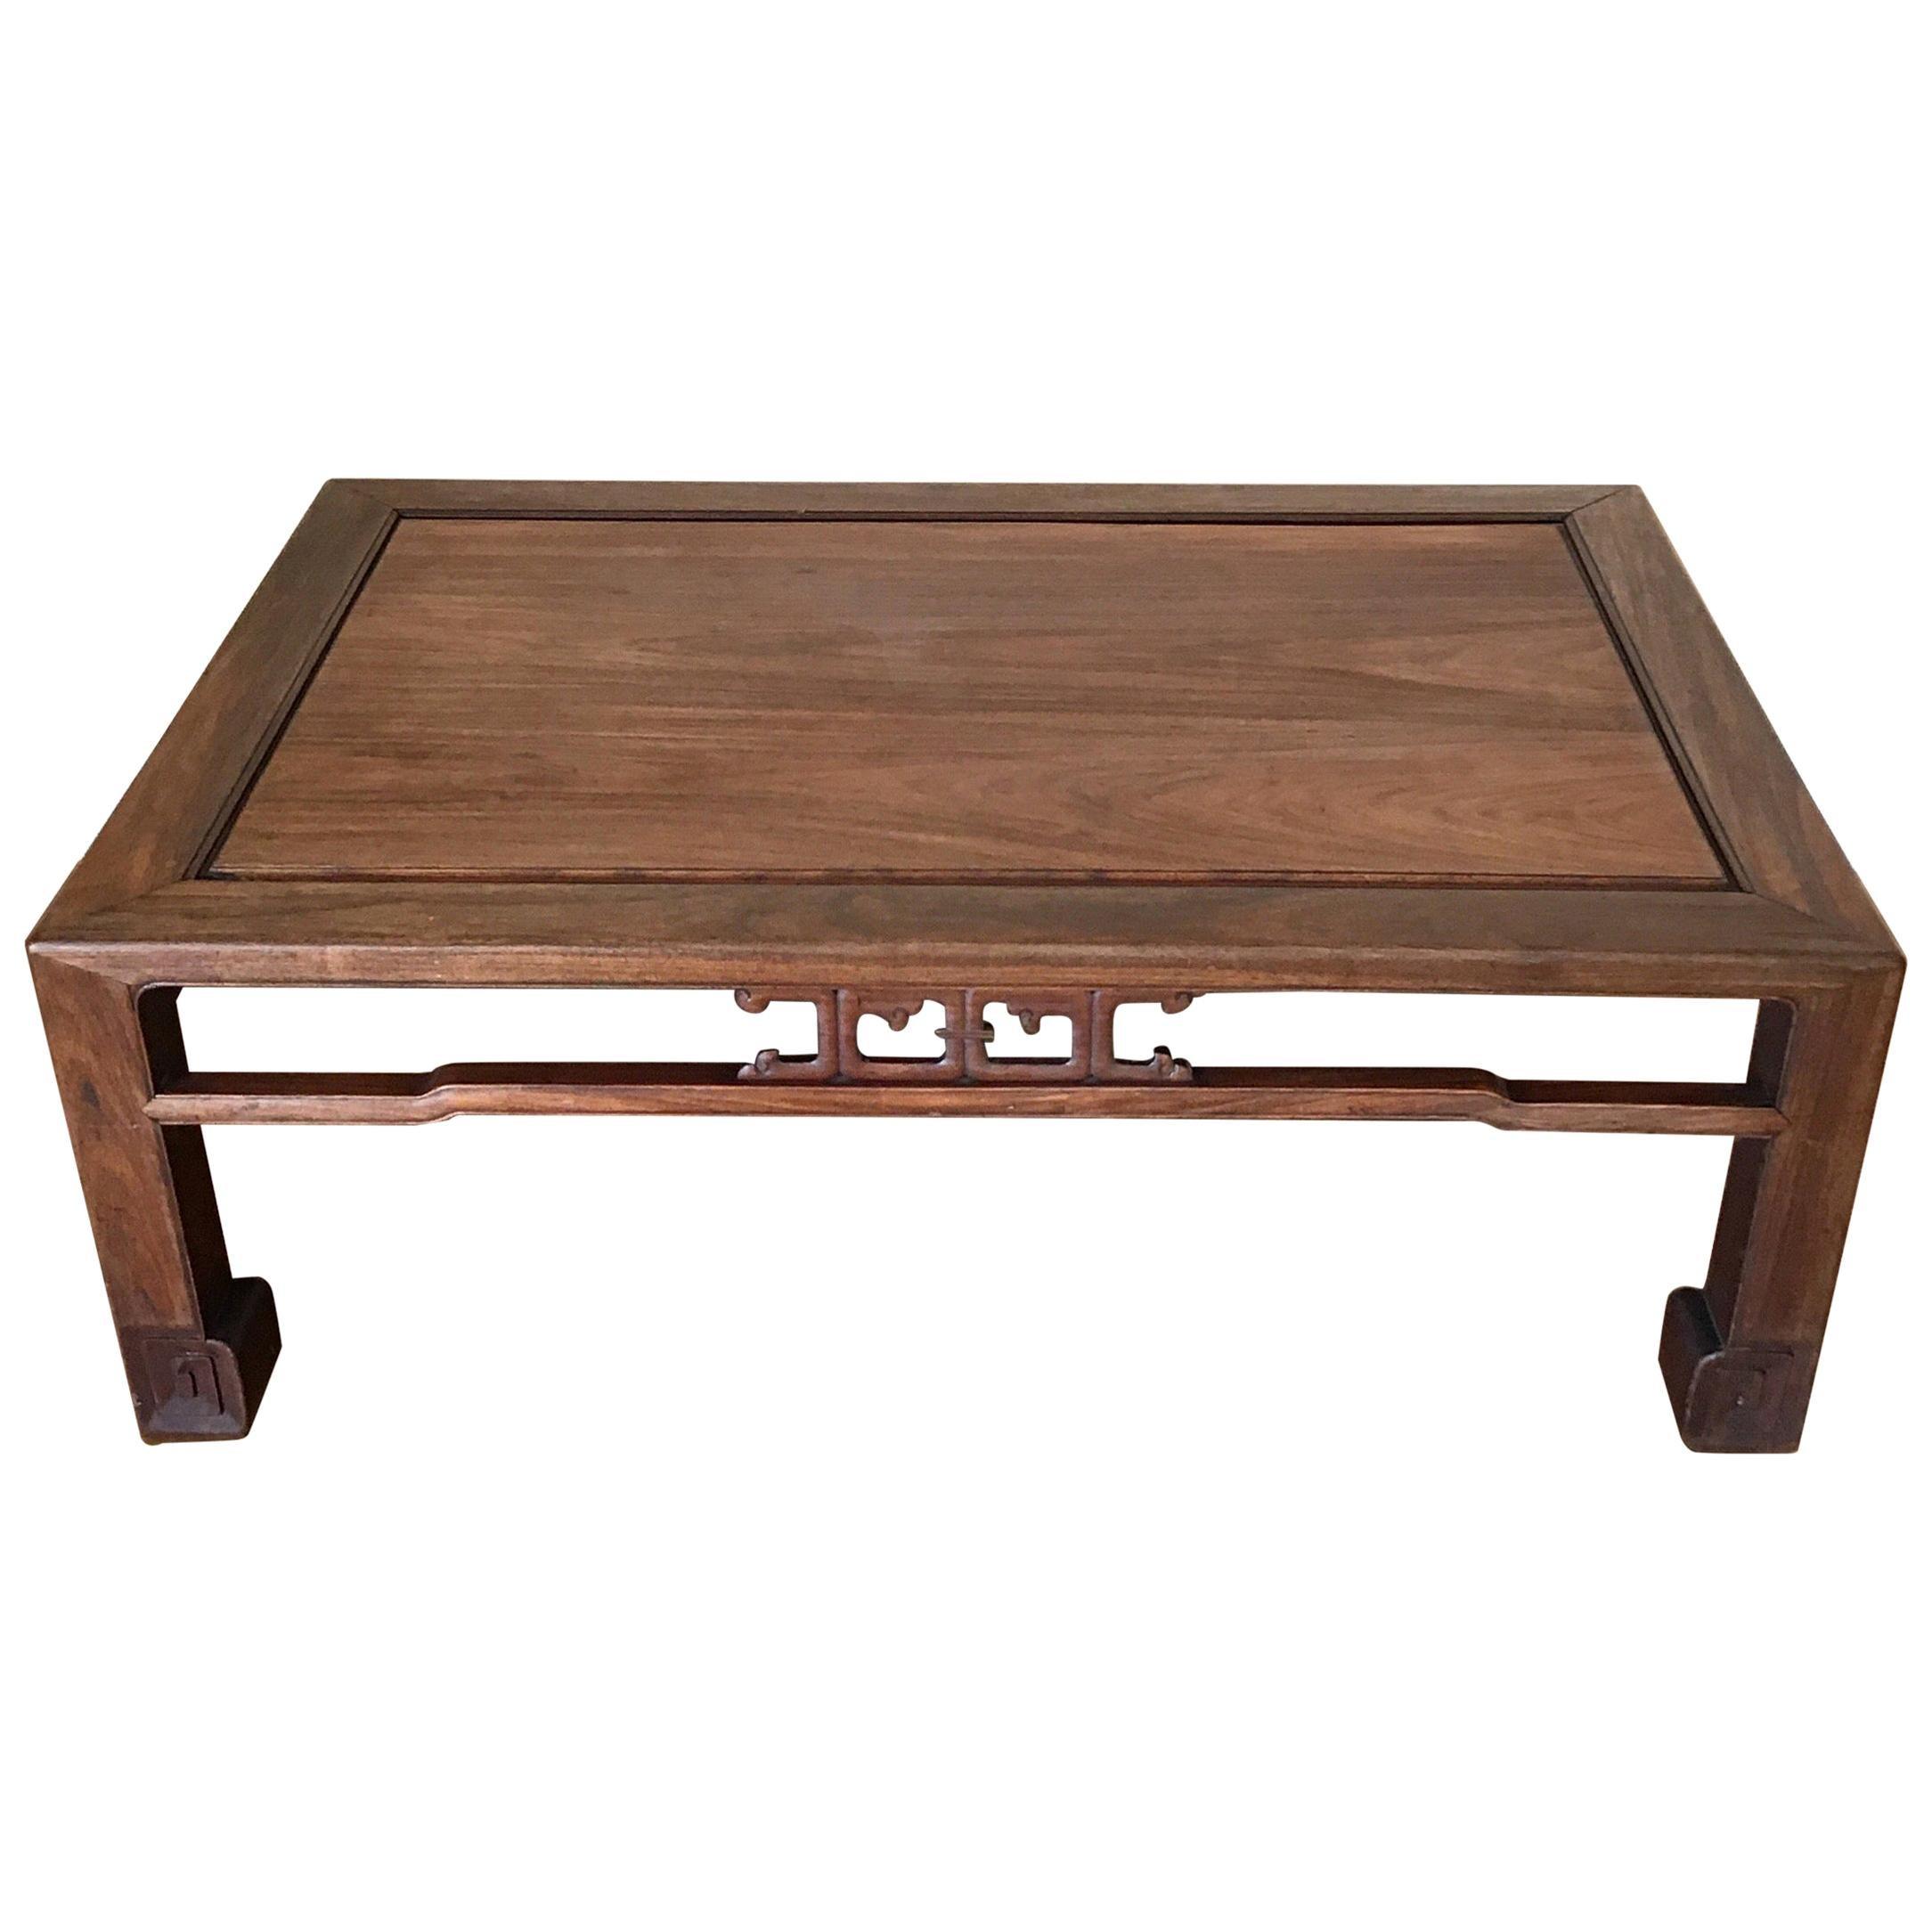 Japanese Mid-19th Century Coffee Table